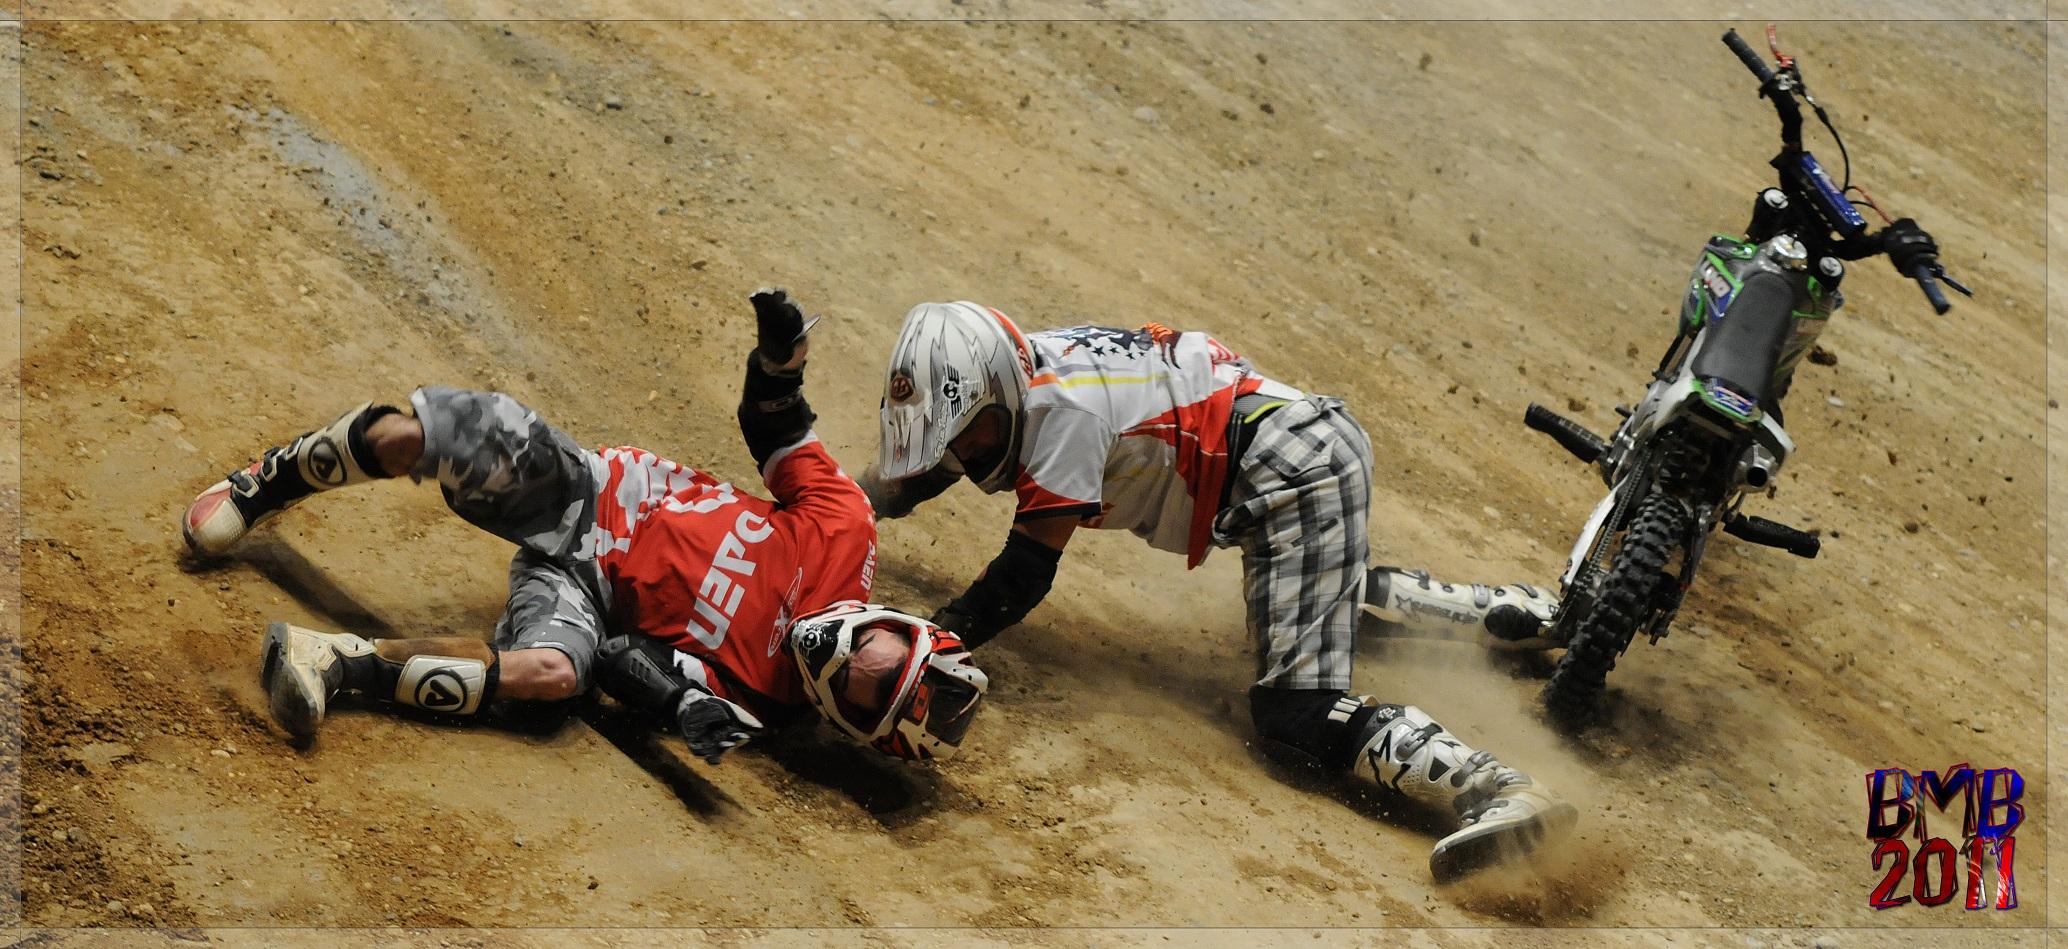 Masters of Dirt 2011